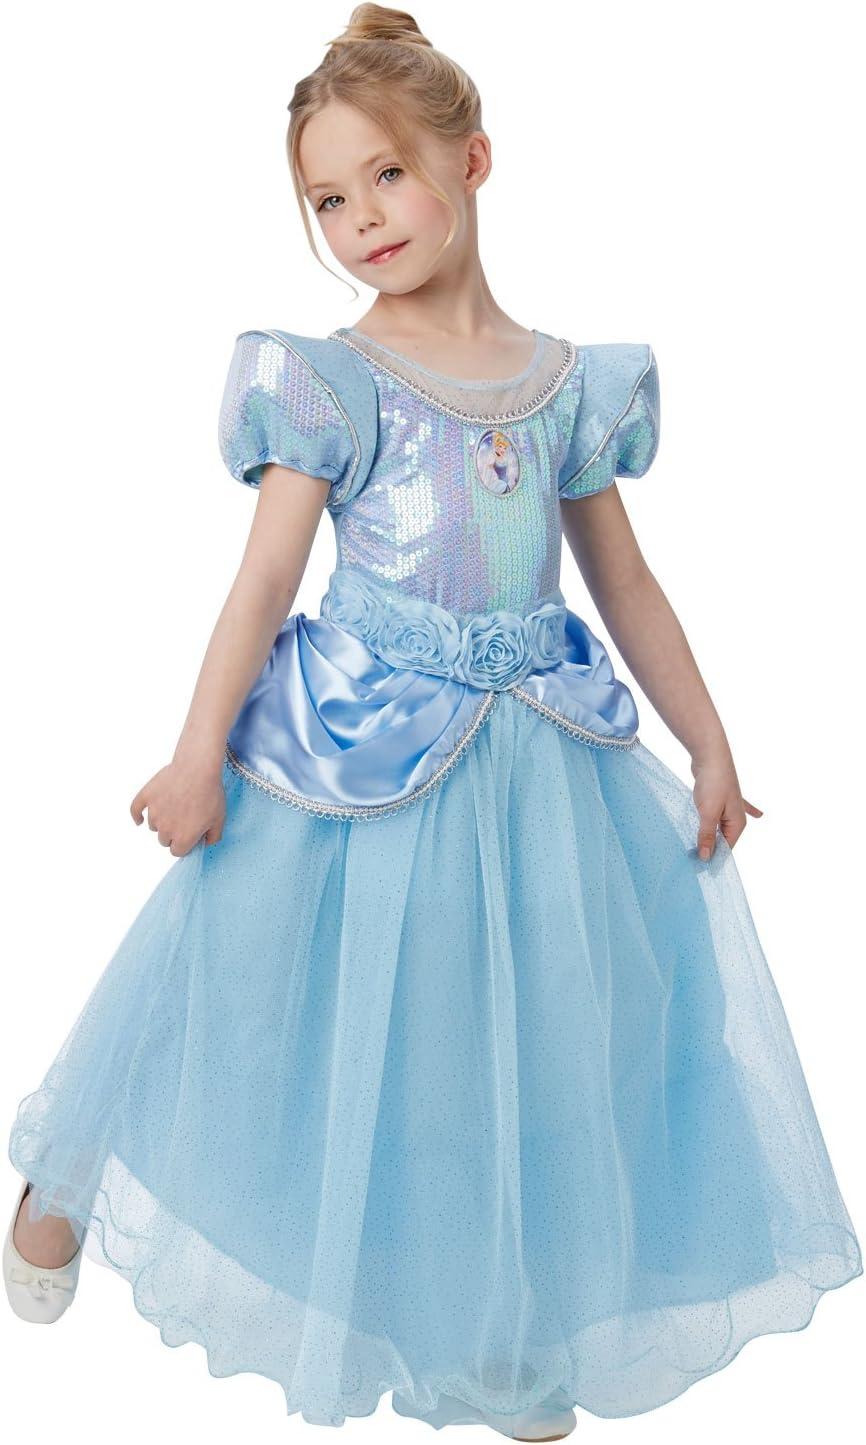 Princesas Disney - Disfraz de Cenicienta Premium para niña ...